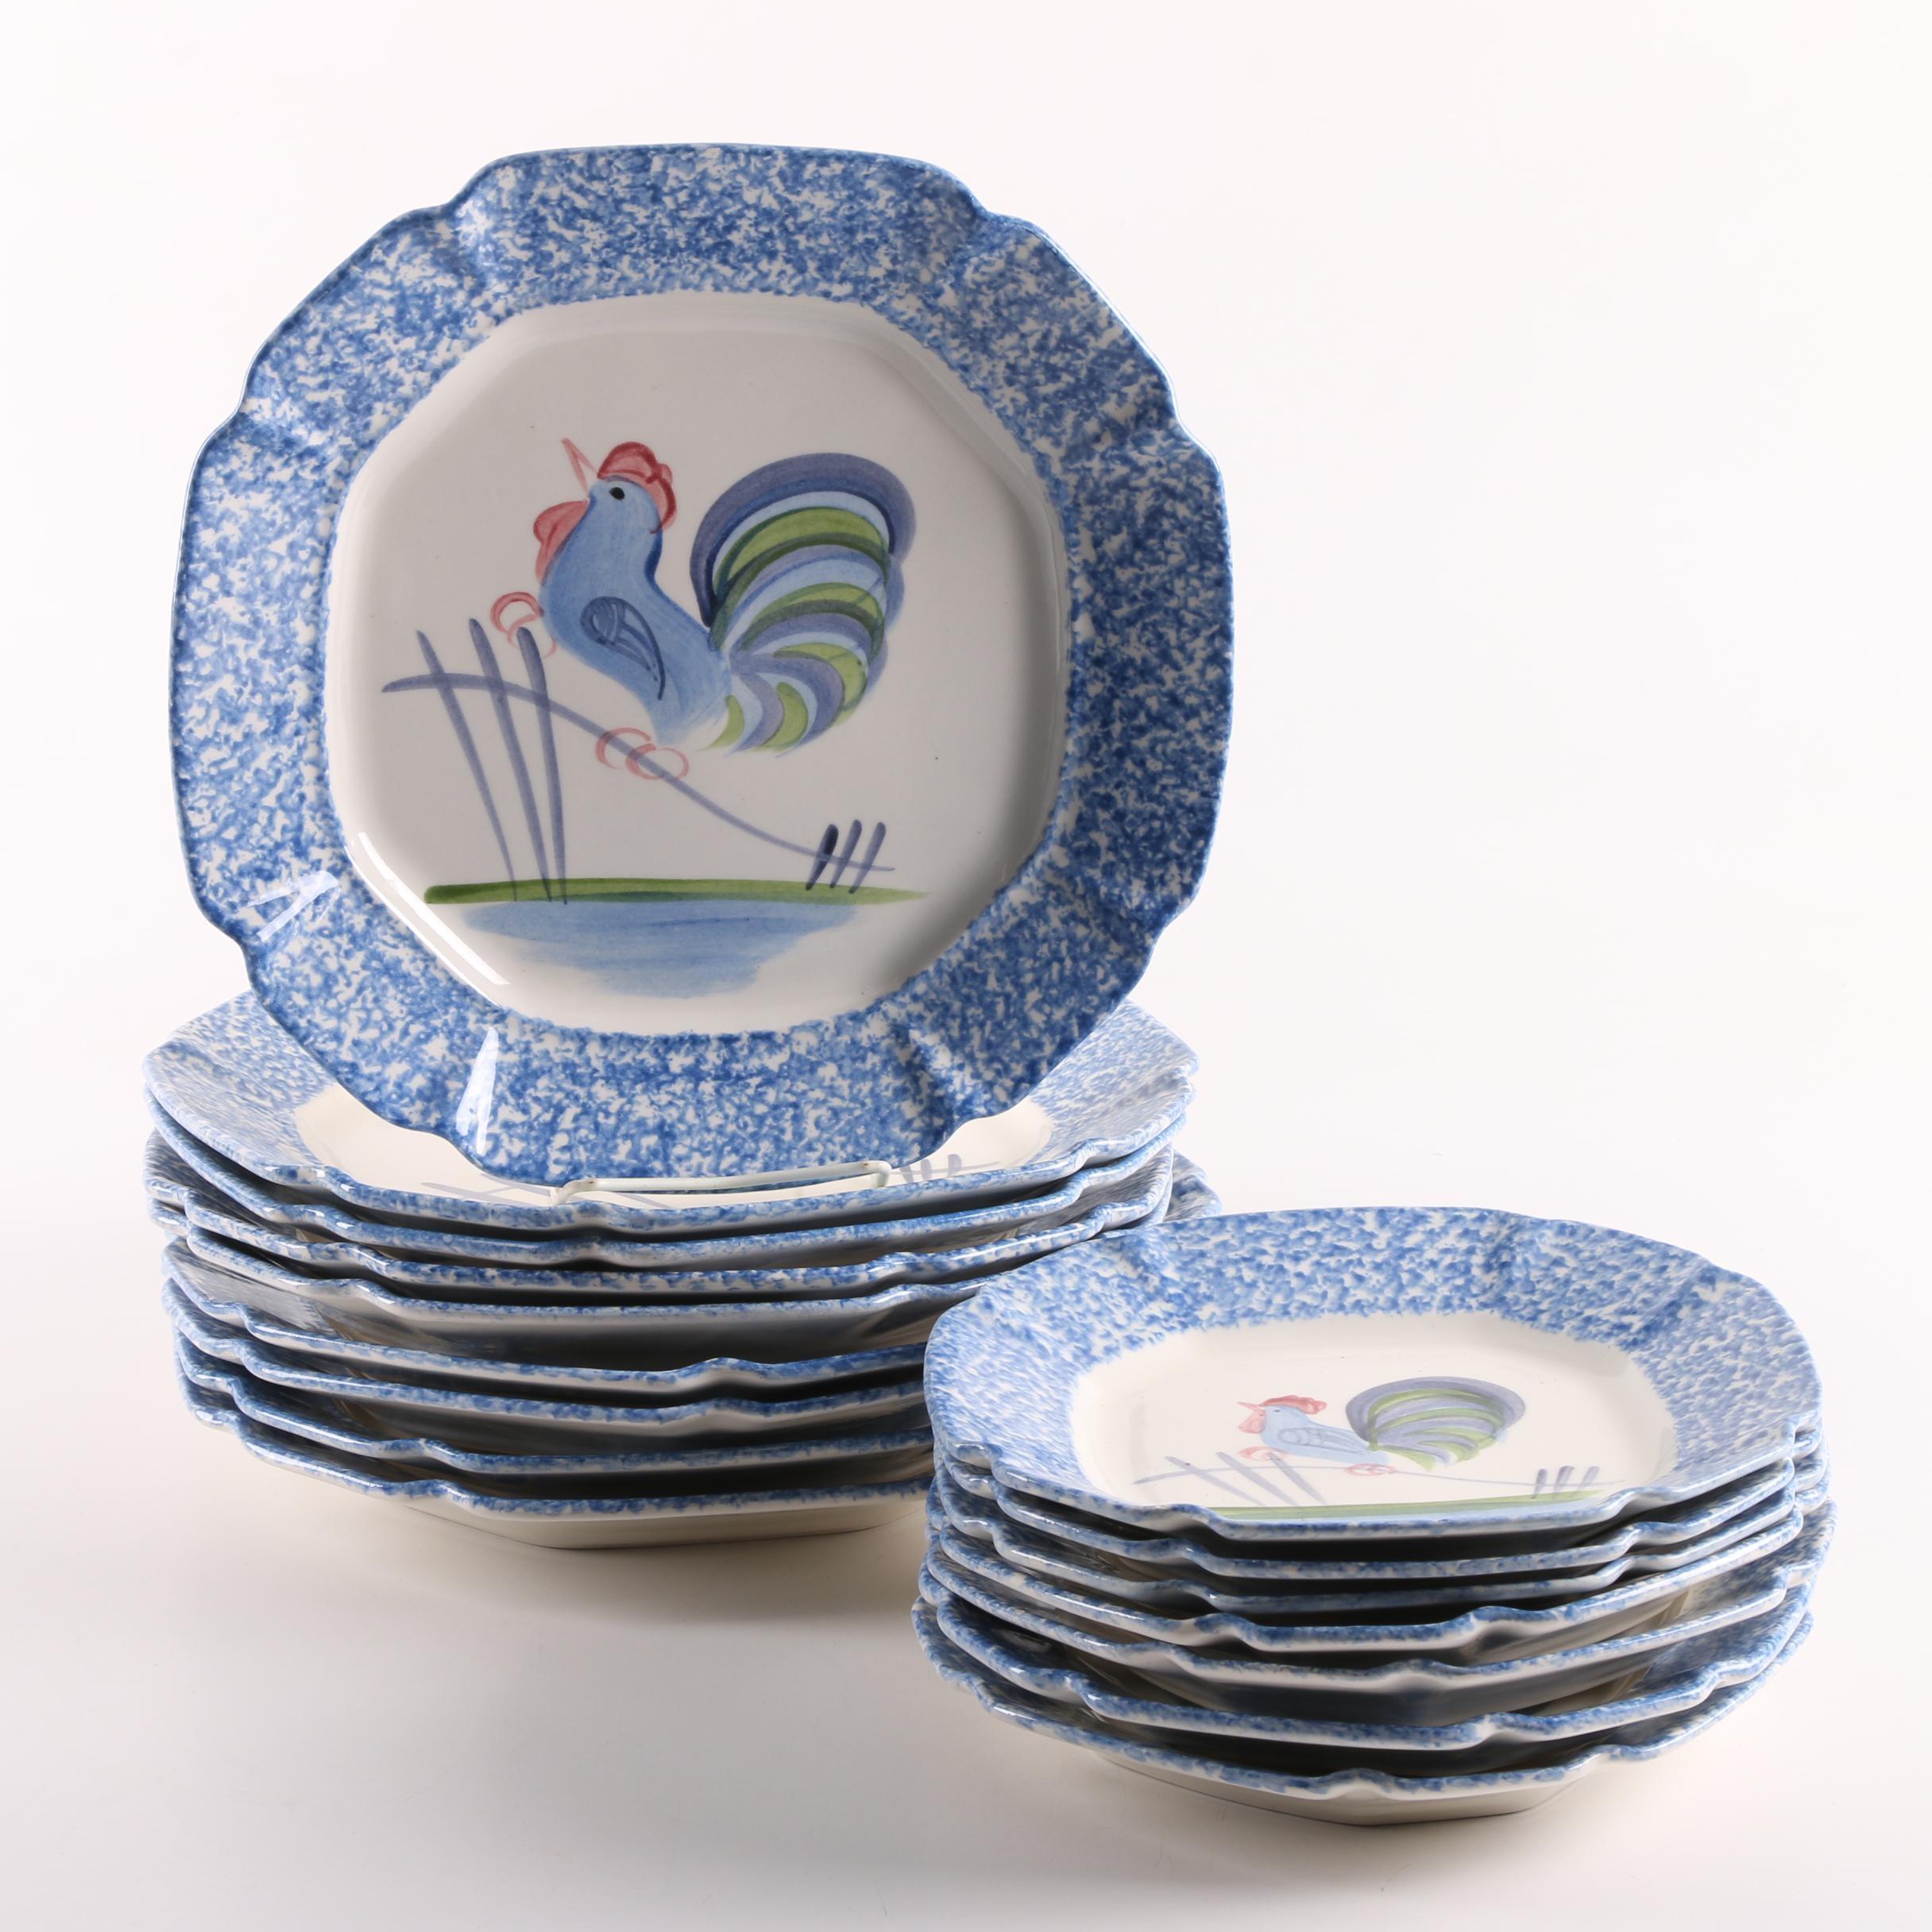 Los Angeles Potteries \ Blue Stipple Rooster\  Tableware ...  sc 1 st  EBTH.com & Los Angeles Potteries \